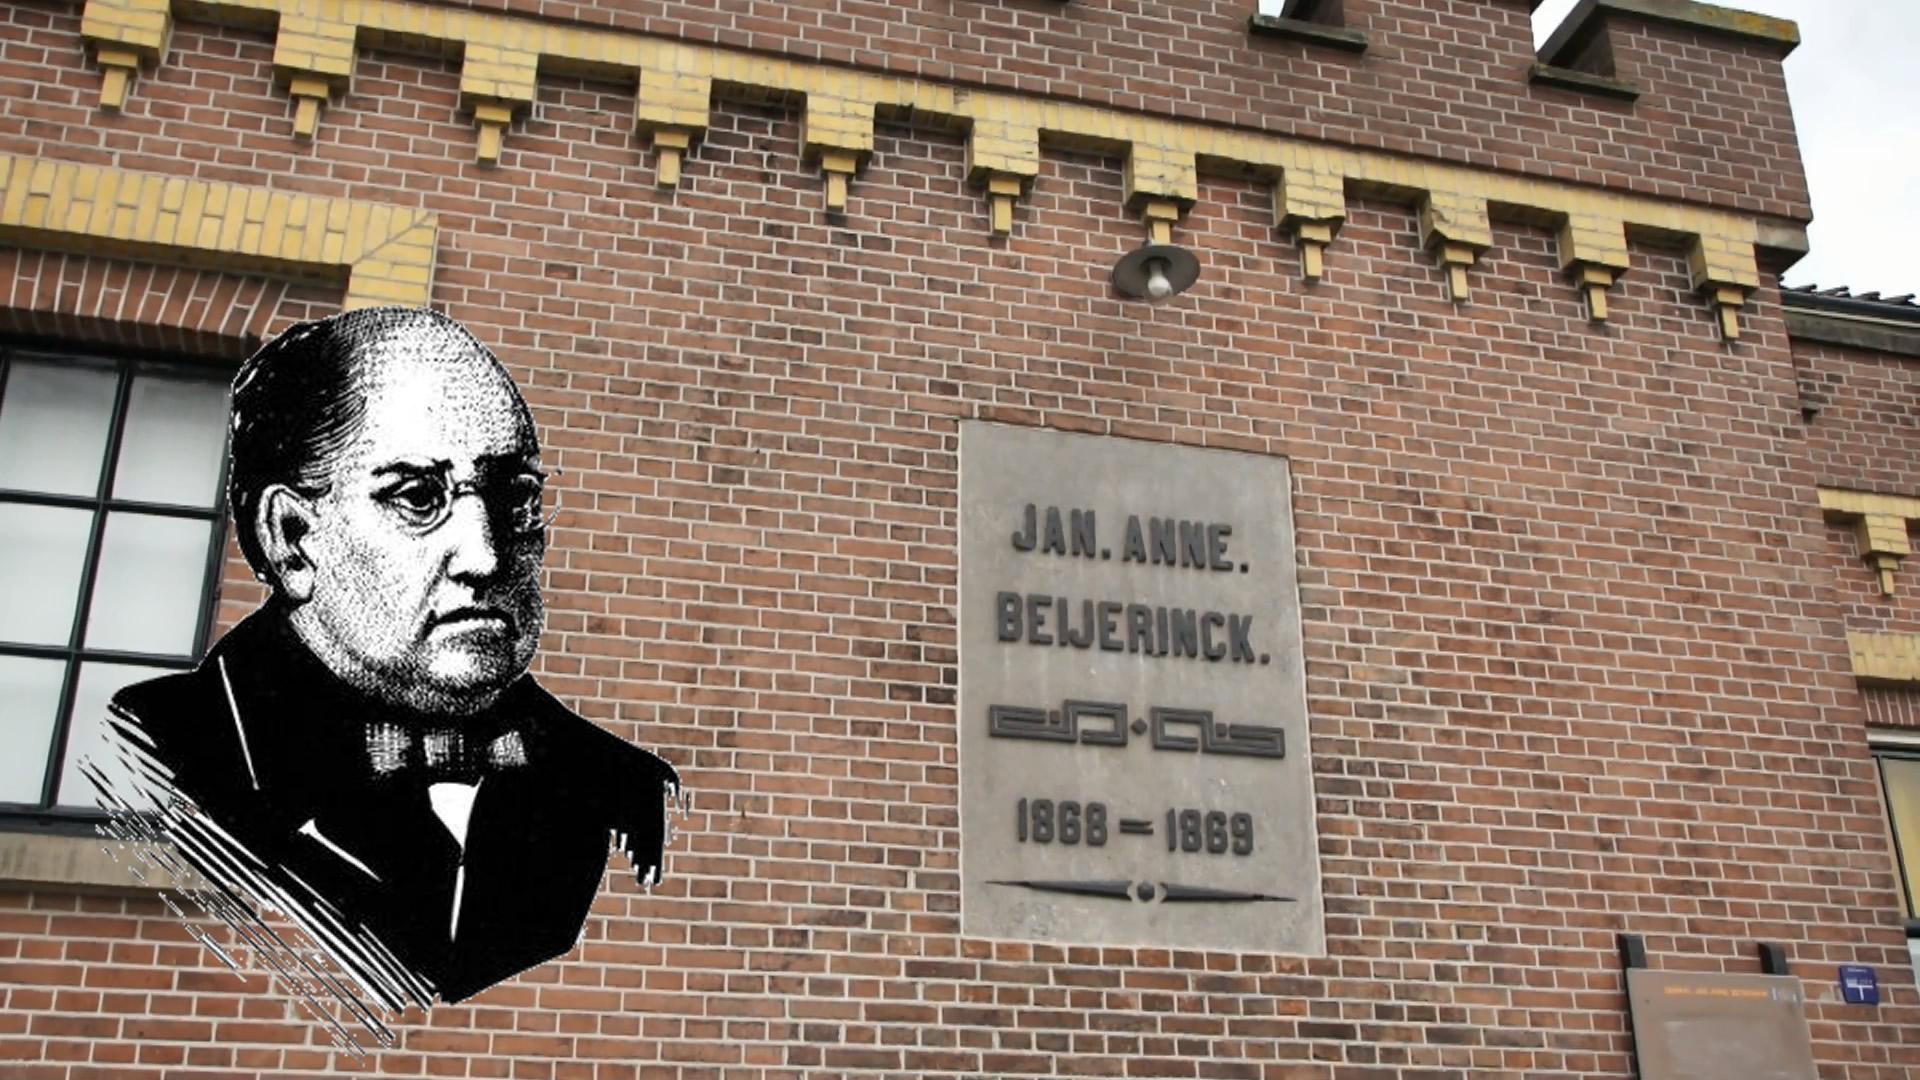 Wie was Jan Anne Beijerinck